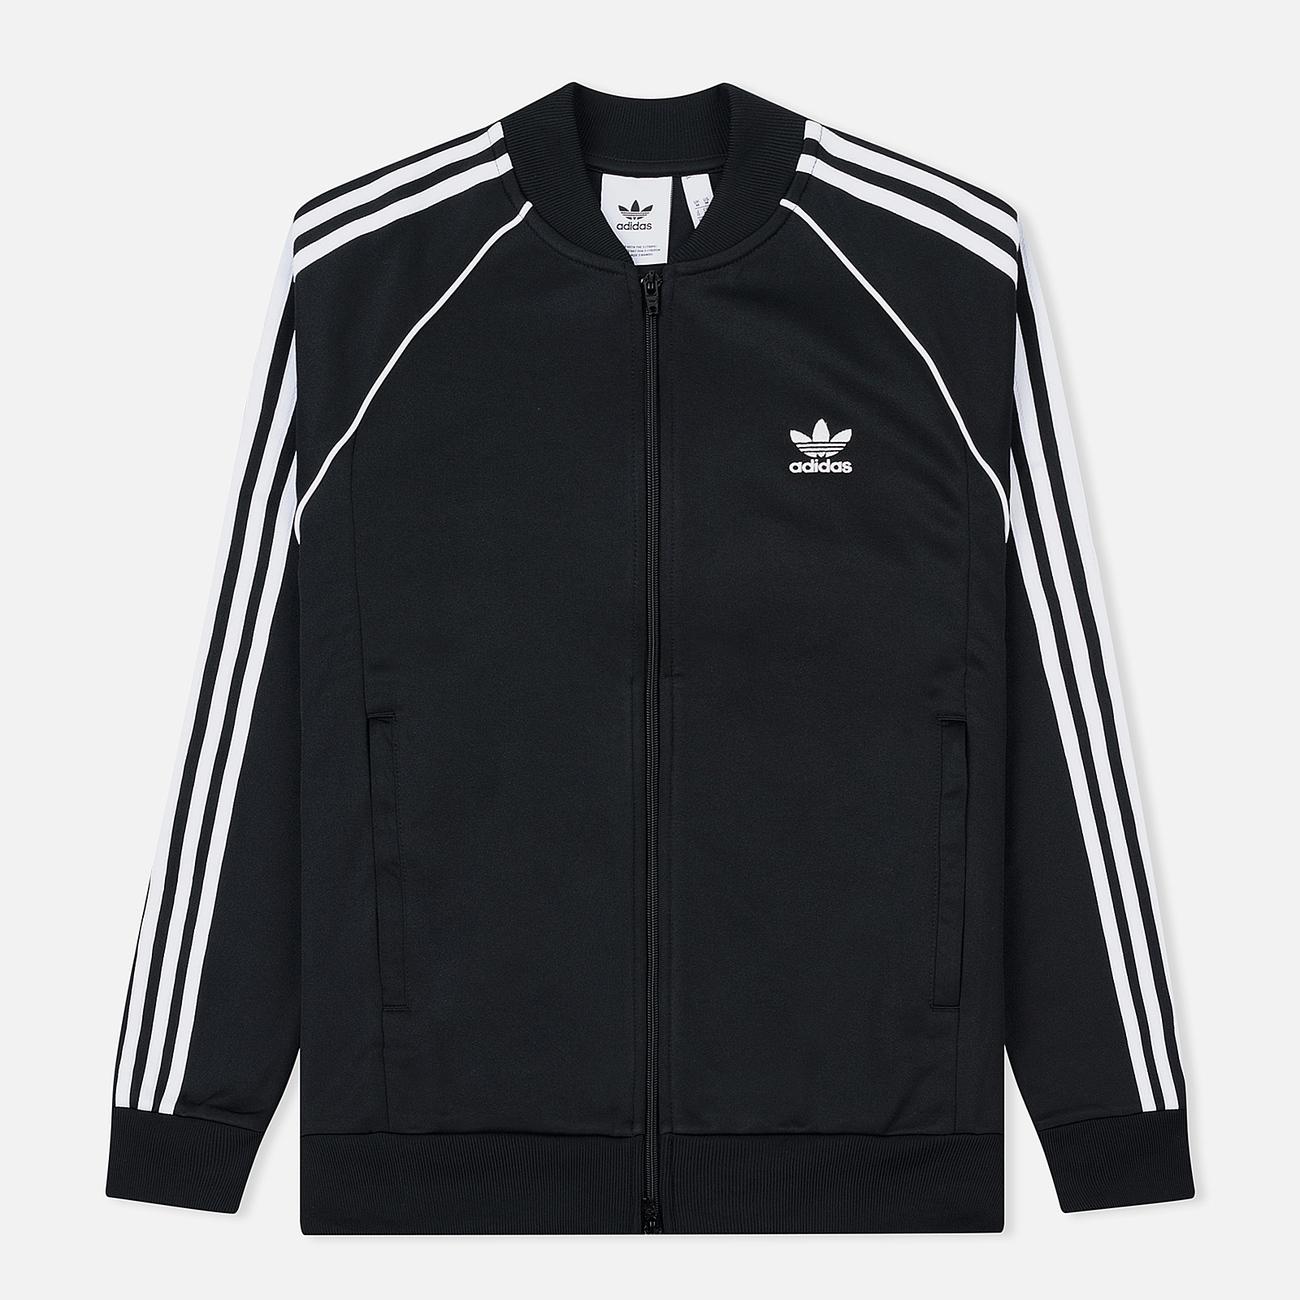 Мужская олимпийка adidas Originals SST 3-Stripes Black